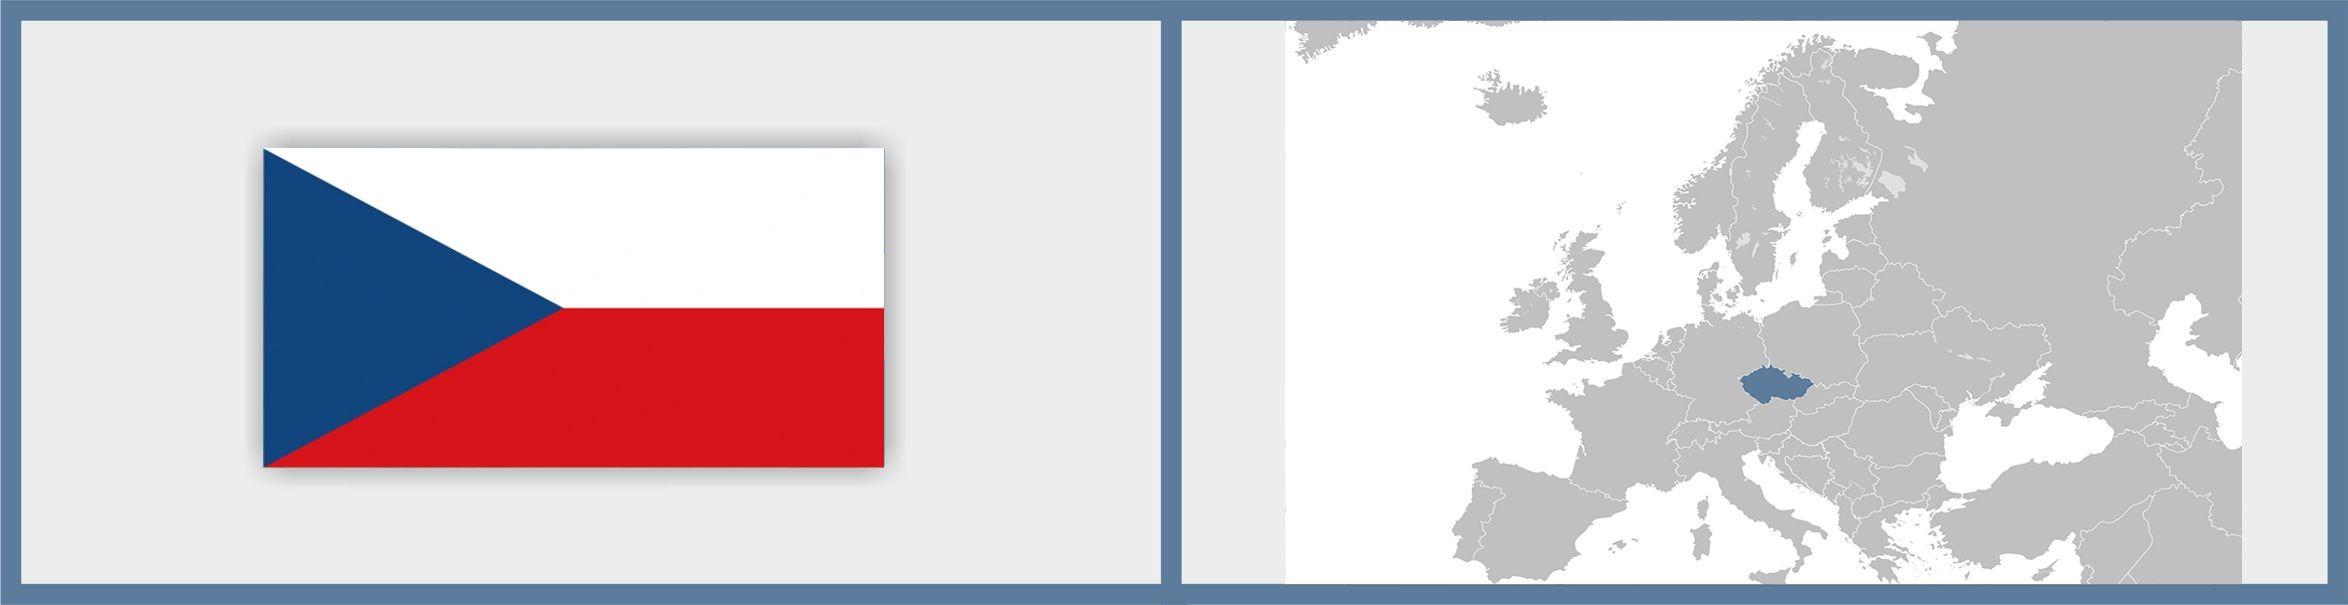 Intellectual Property in Czech Republic